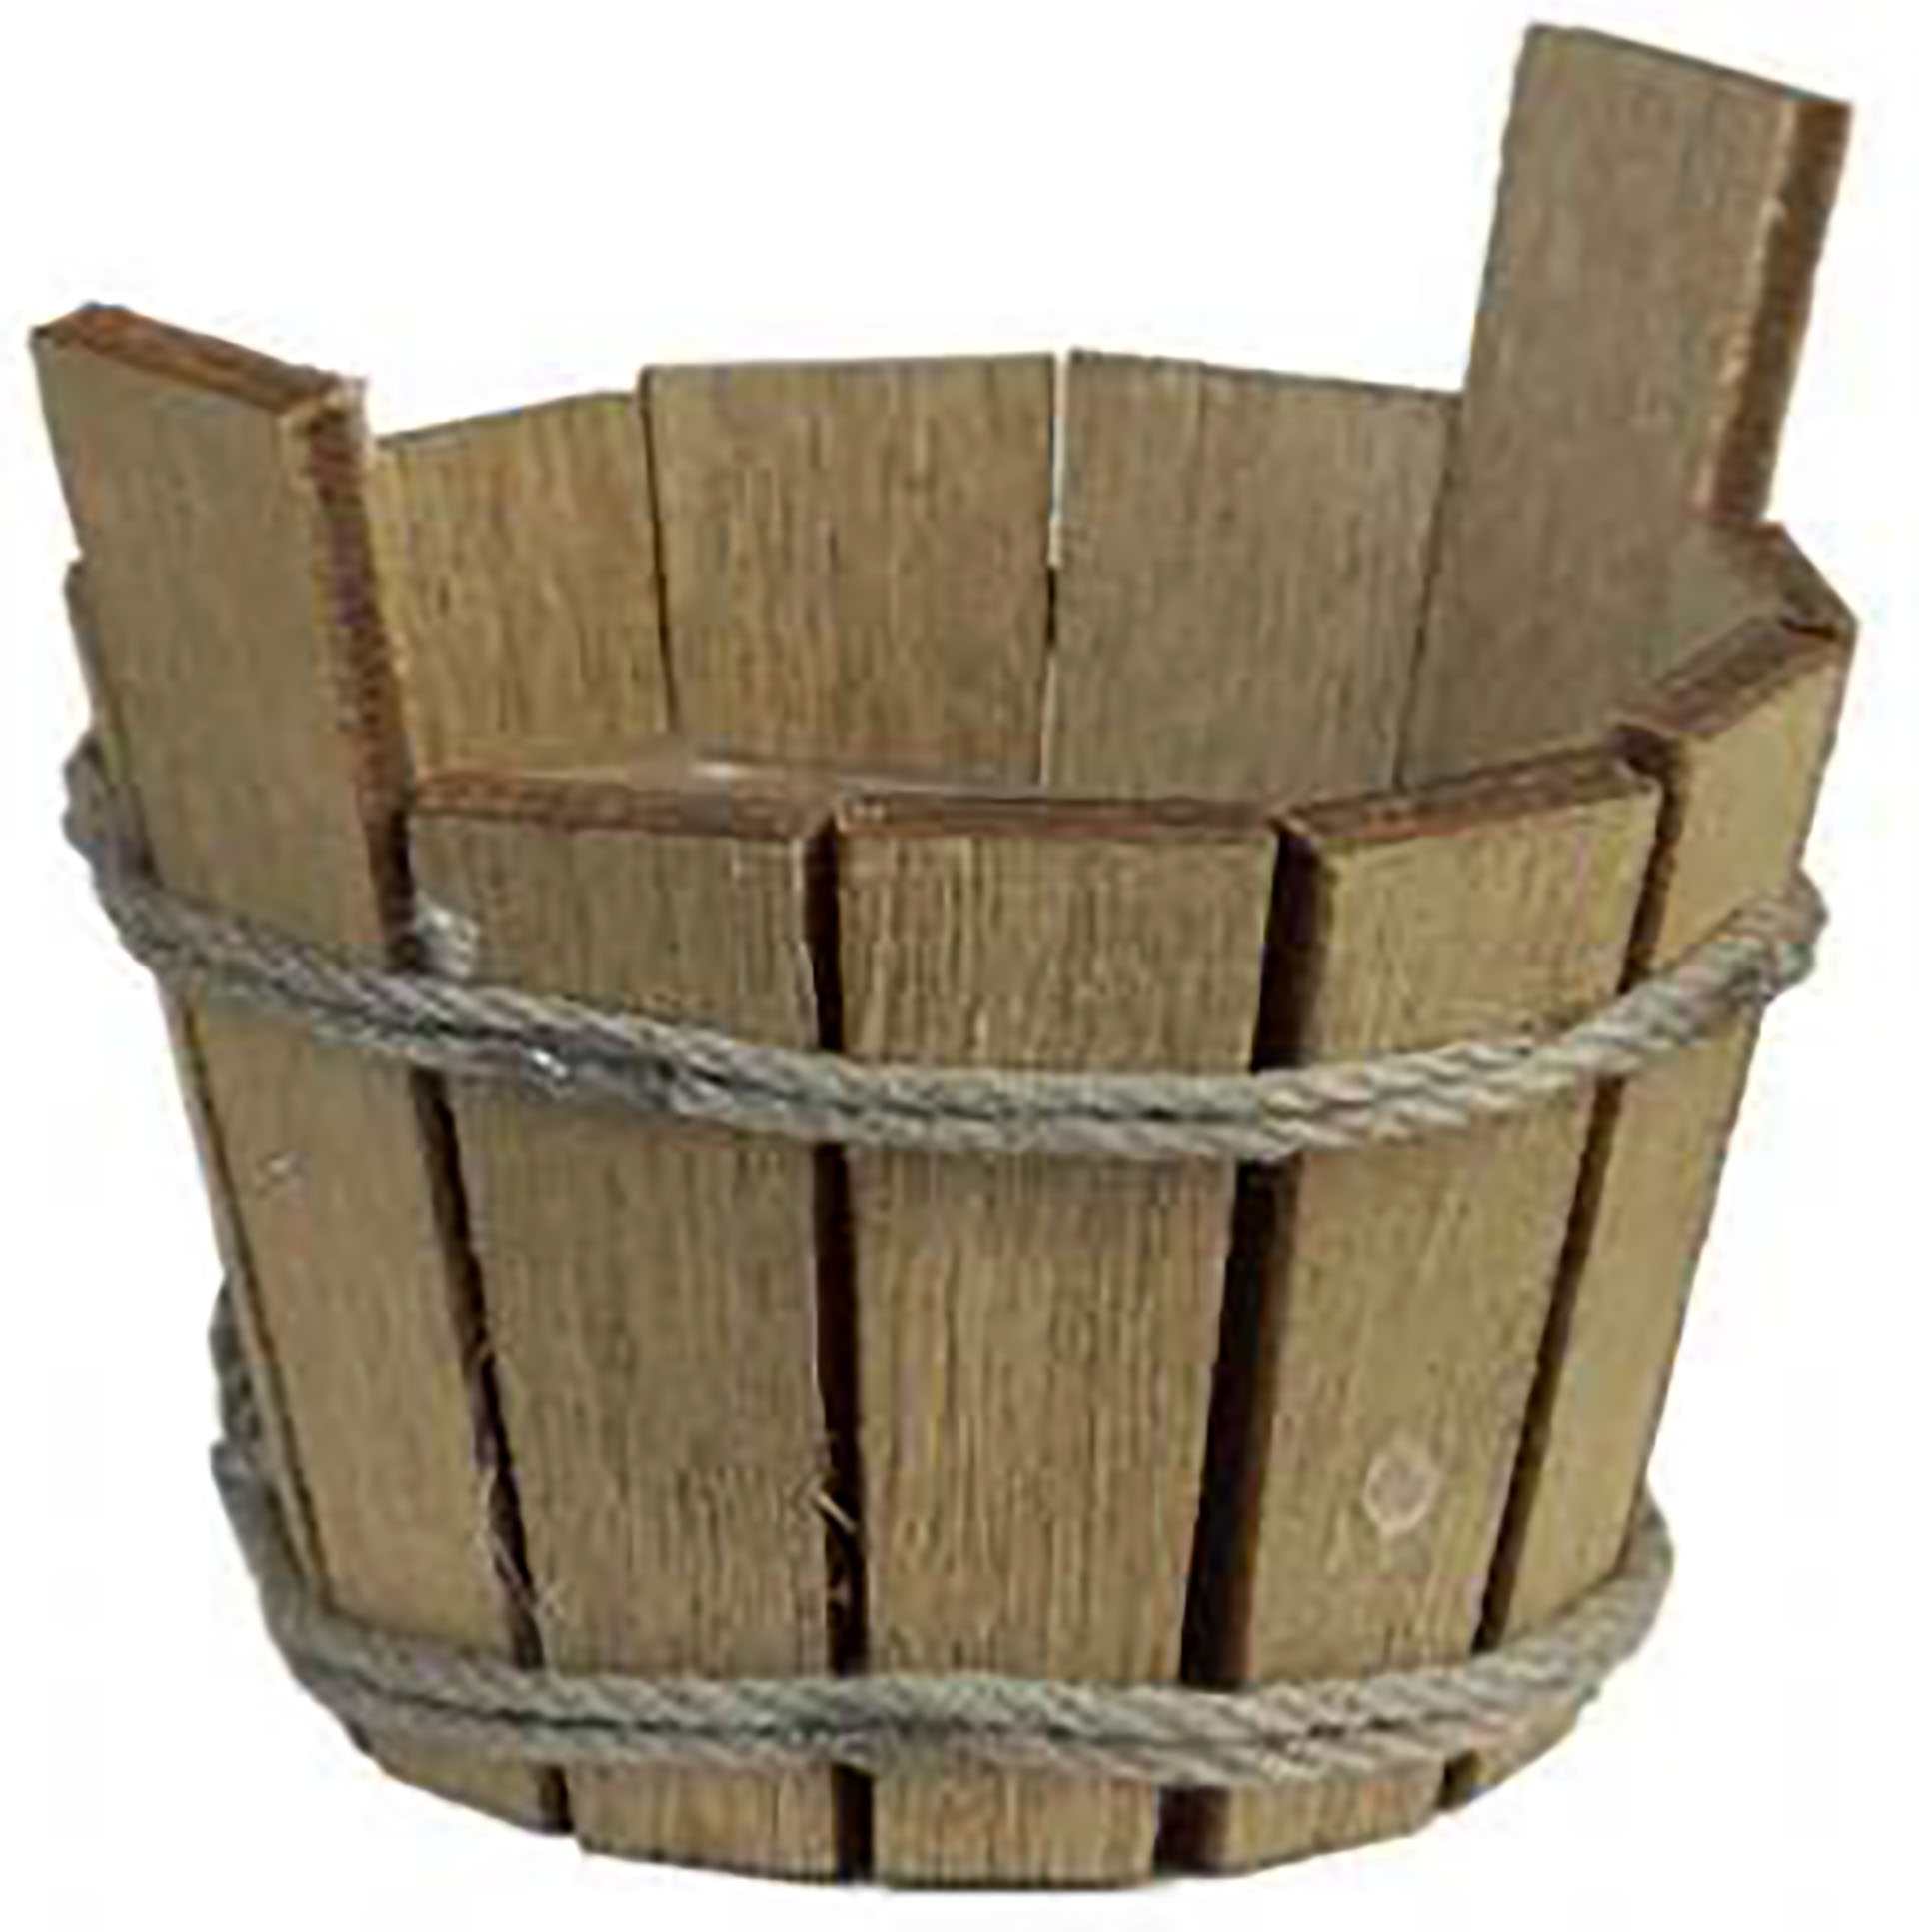 Holzbottich 4cm